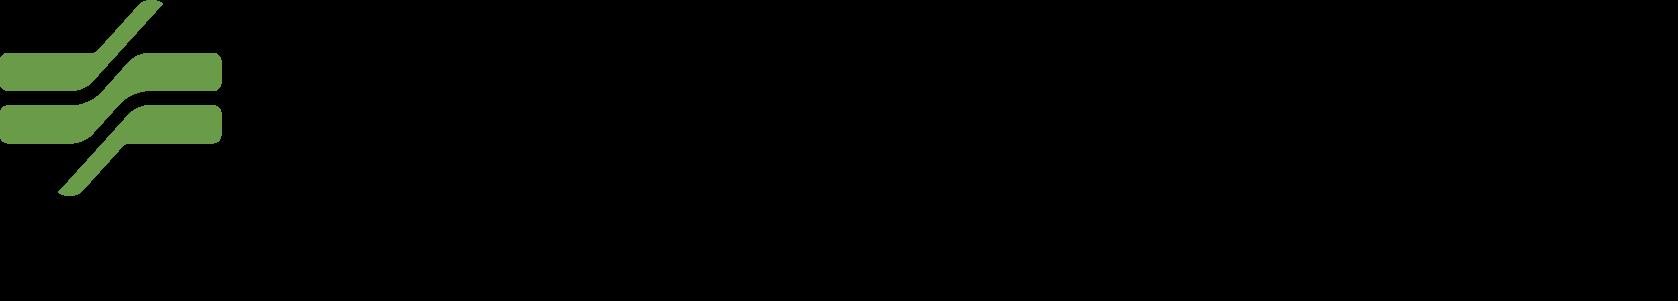 Logo Banca Alpi marittime@4x